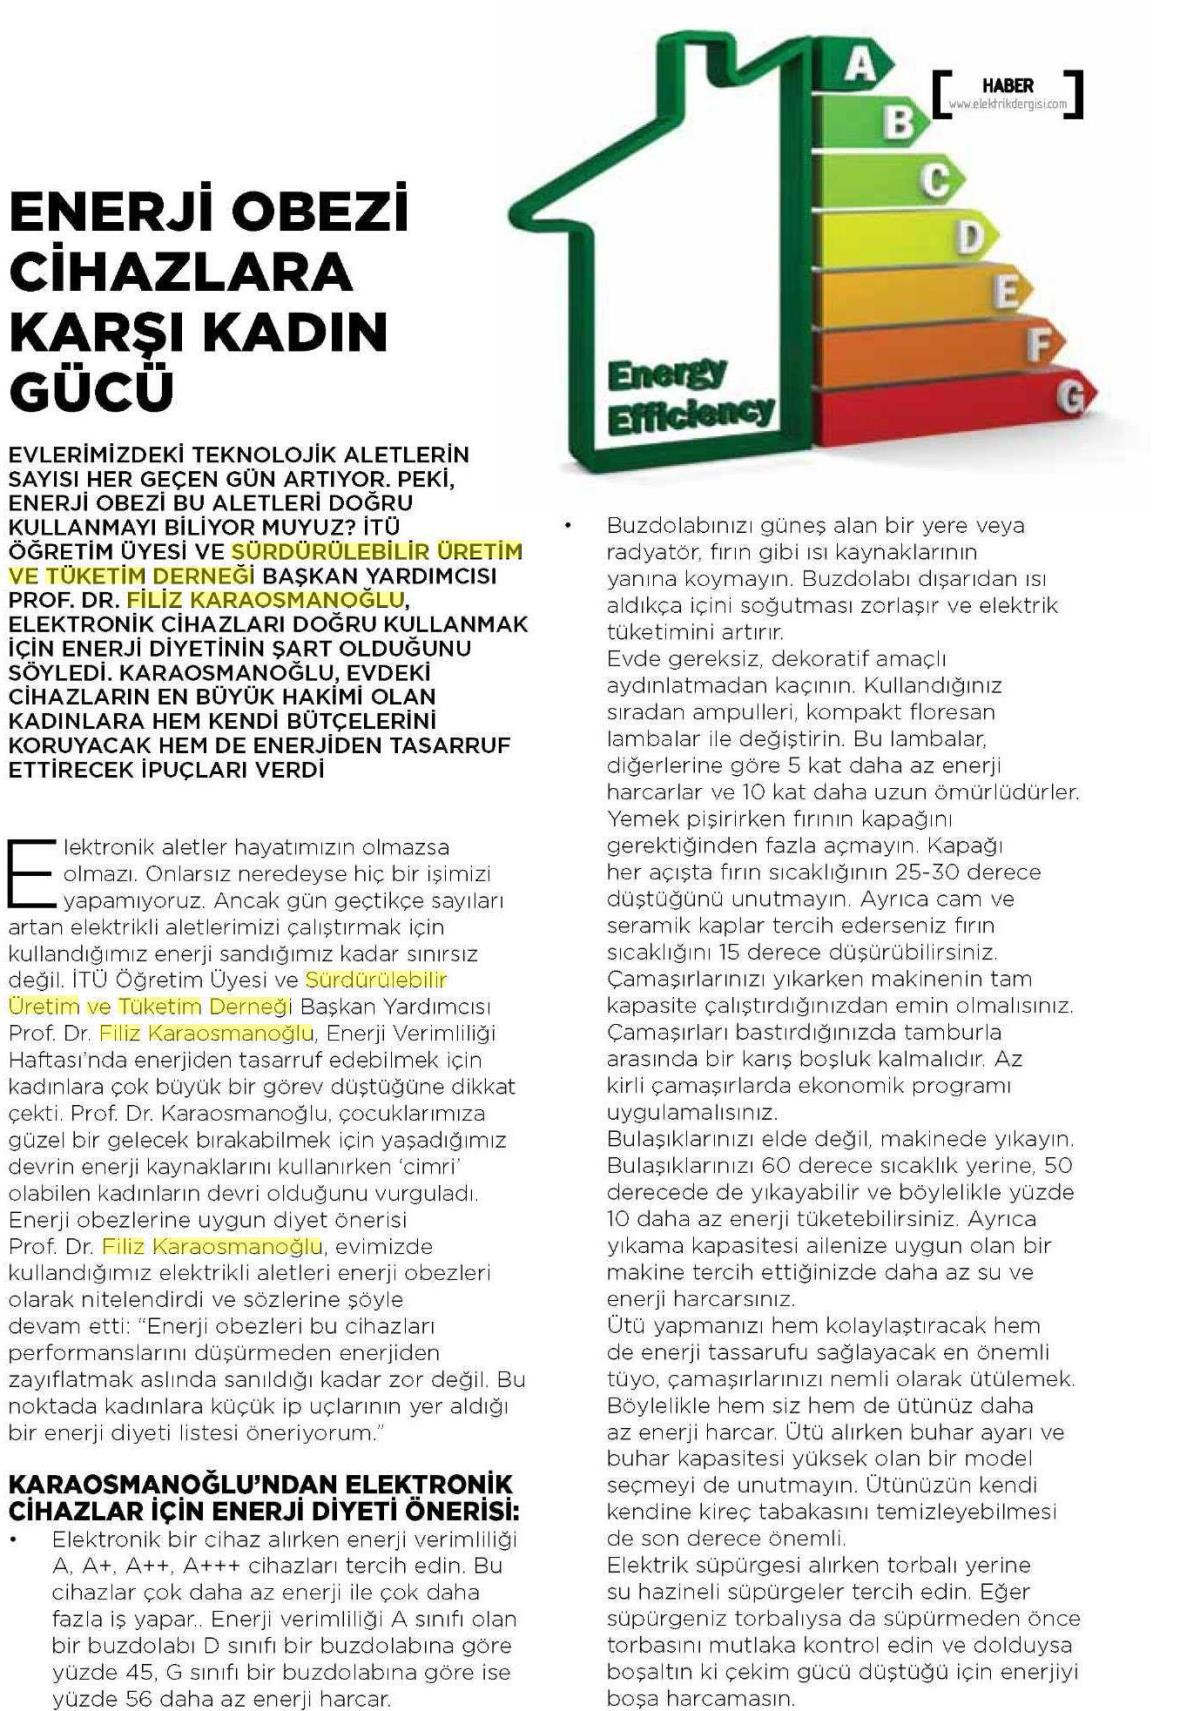 Kaynak Elektrik Dergisi 01.01.2016